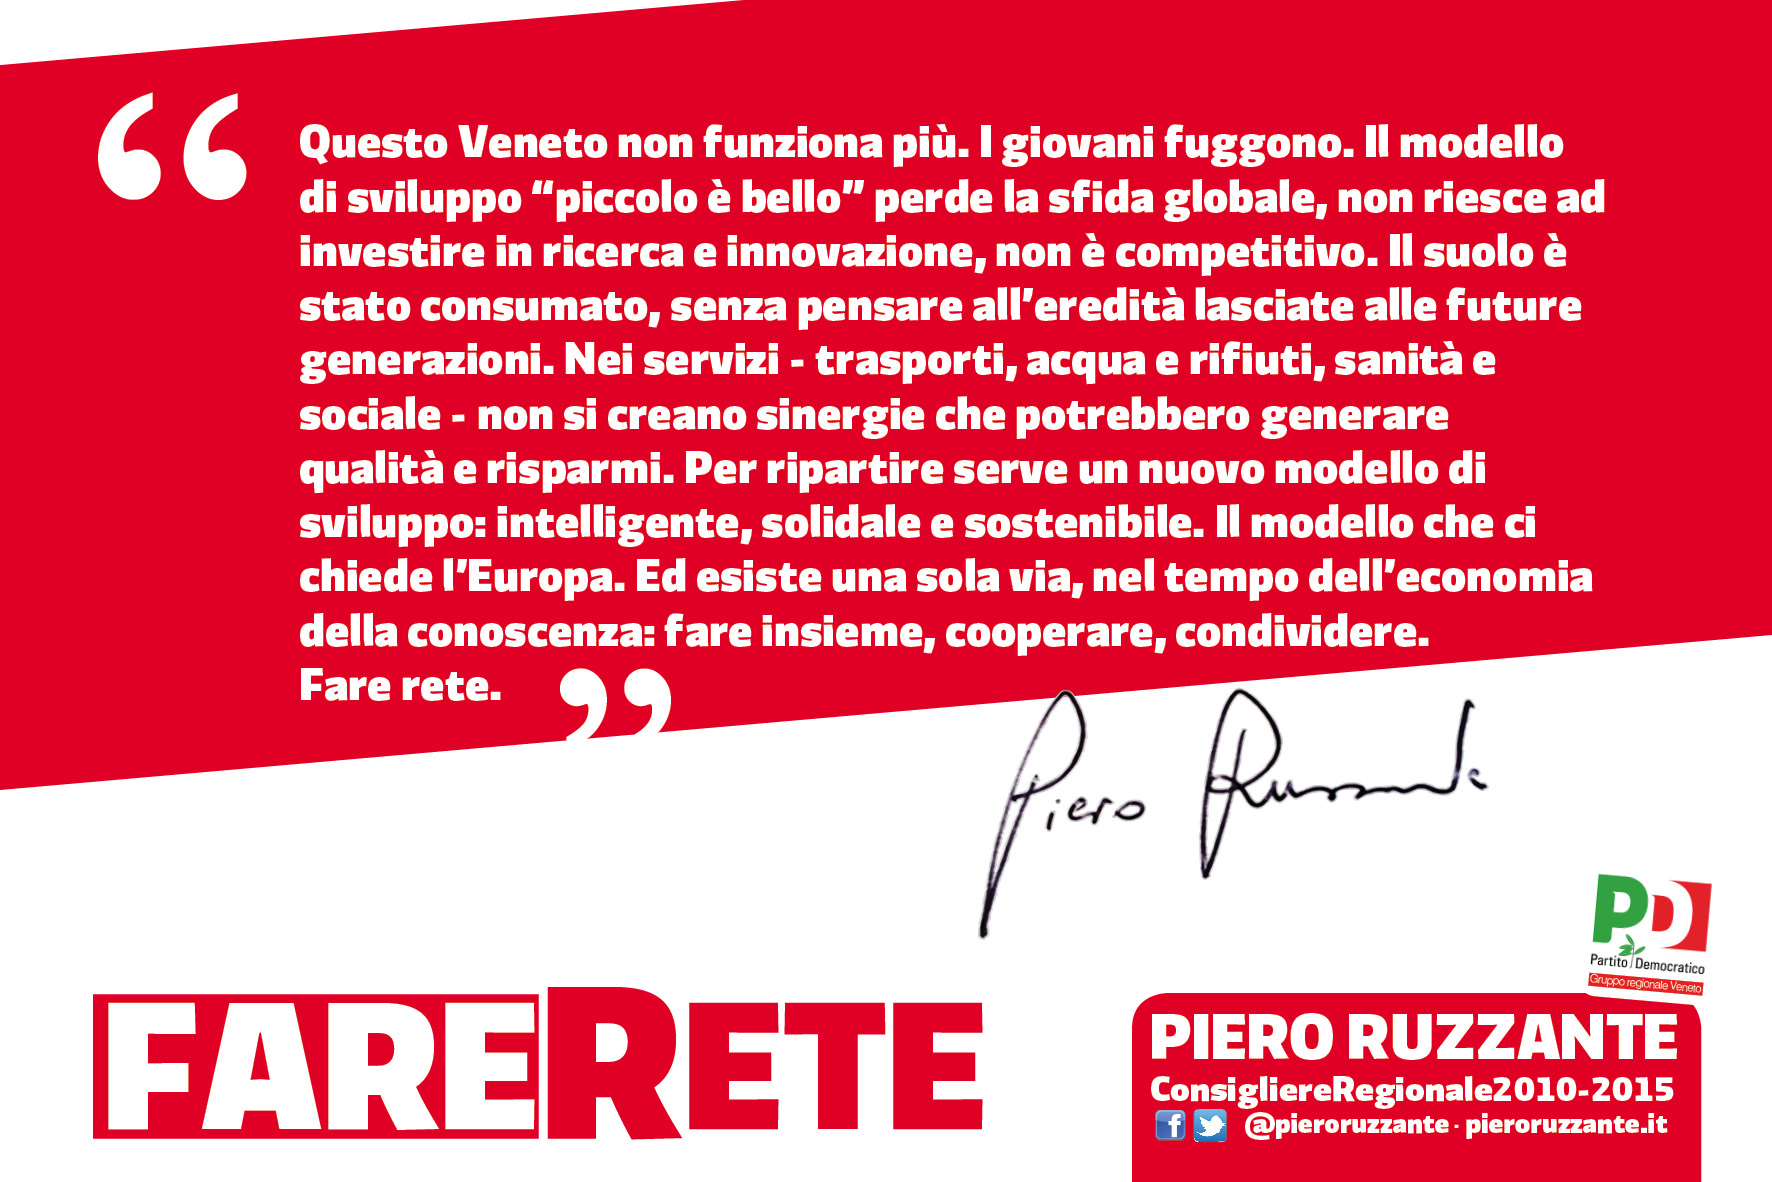 RuzzanteFareRete